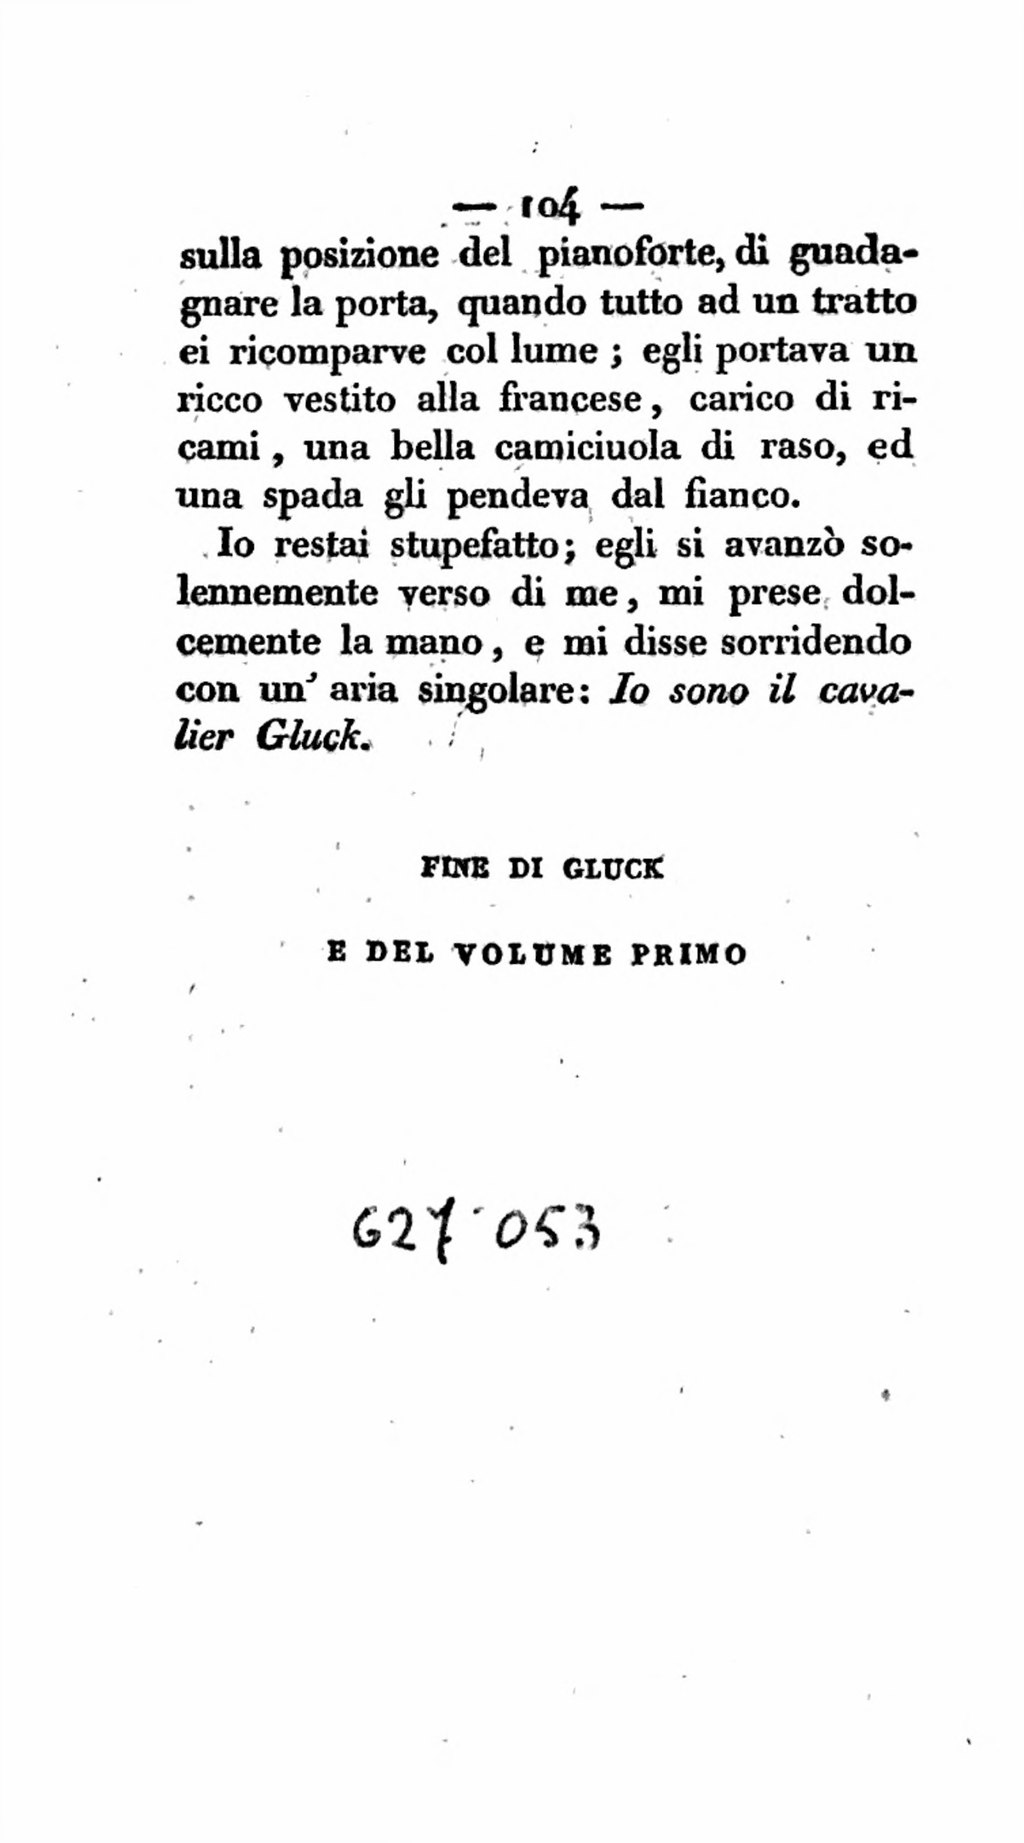 Alla Francese Posizione pagina:hoffmann - racconti i, milano, 1835.djvu/167 - wikisource